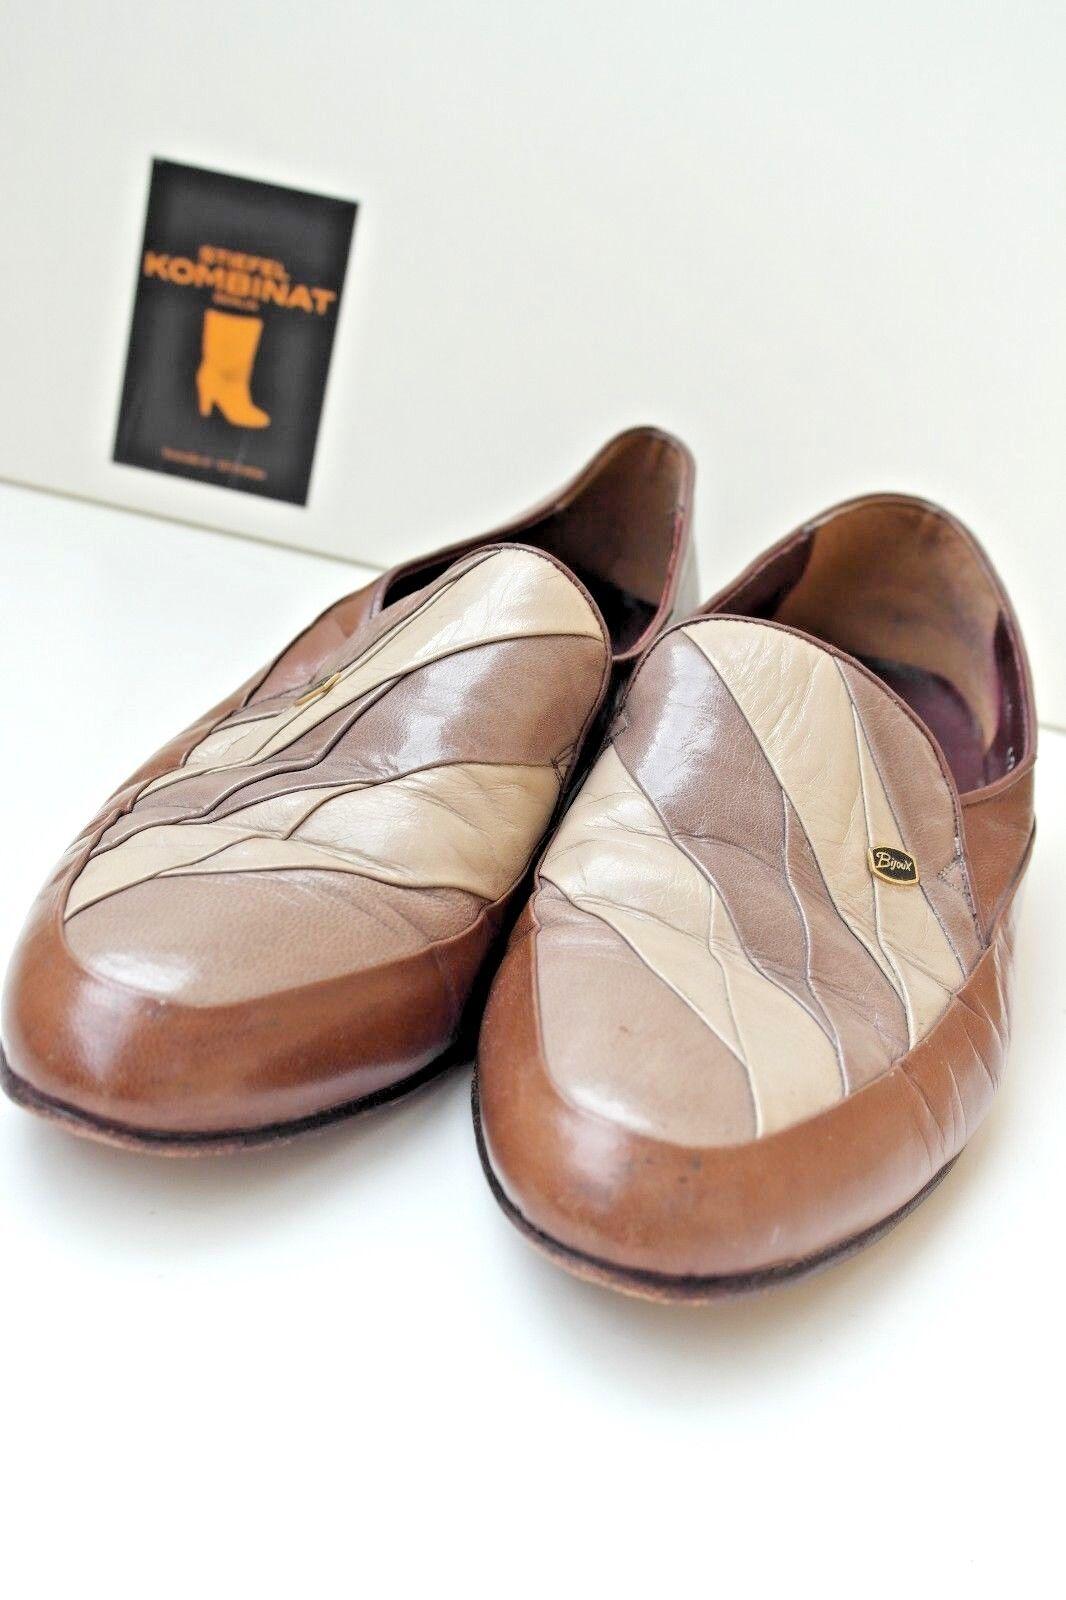 Halbschuhe Loafer Mallorca Schuhe Herren Leder Vintage Bijoux Uk P0O8nkXw